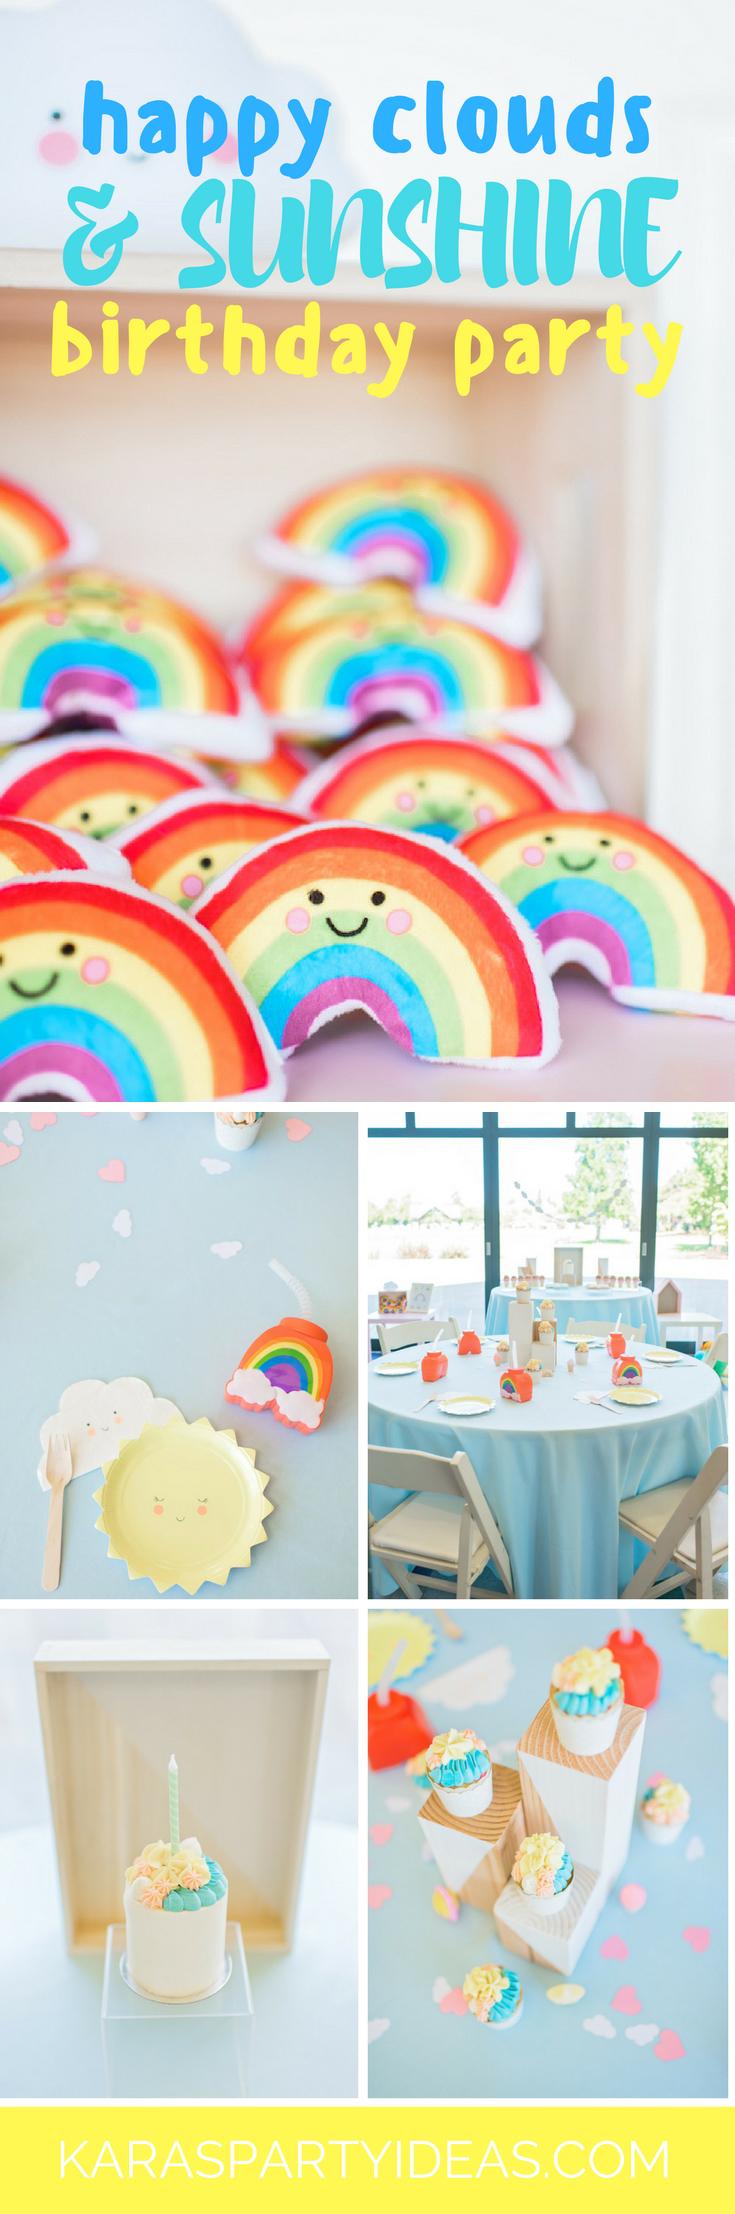 Tea time tea birthday party via kara s party ideas karaspartyideas com - Happy Clouds And Sunshine Birthday Party Via Kara S Party Ideas Karaspartyideas Com